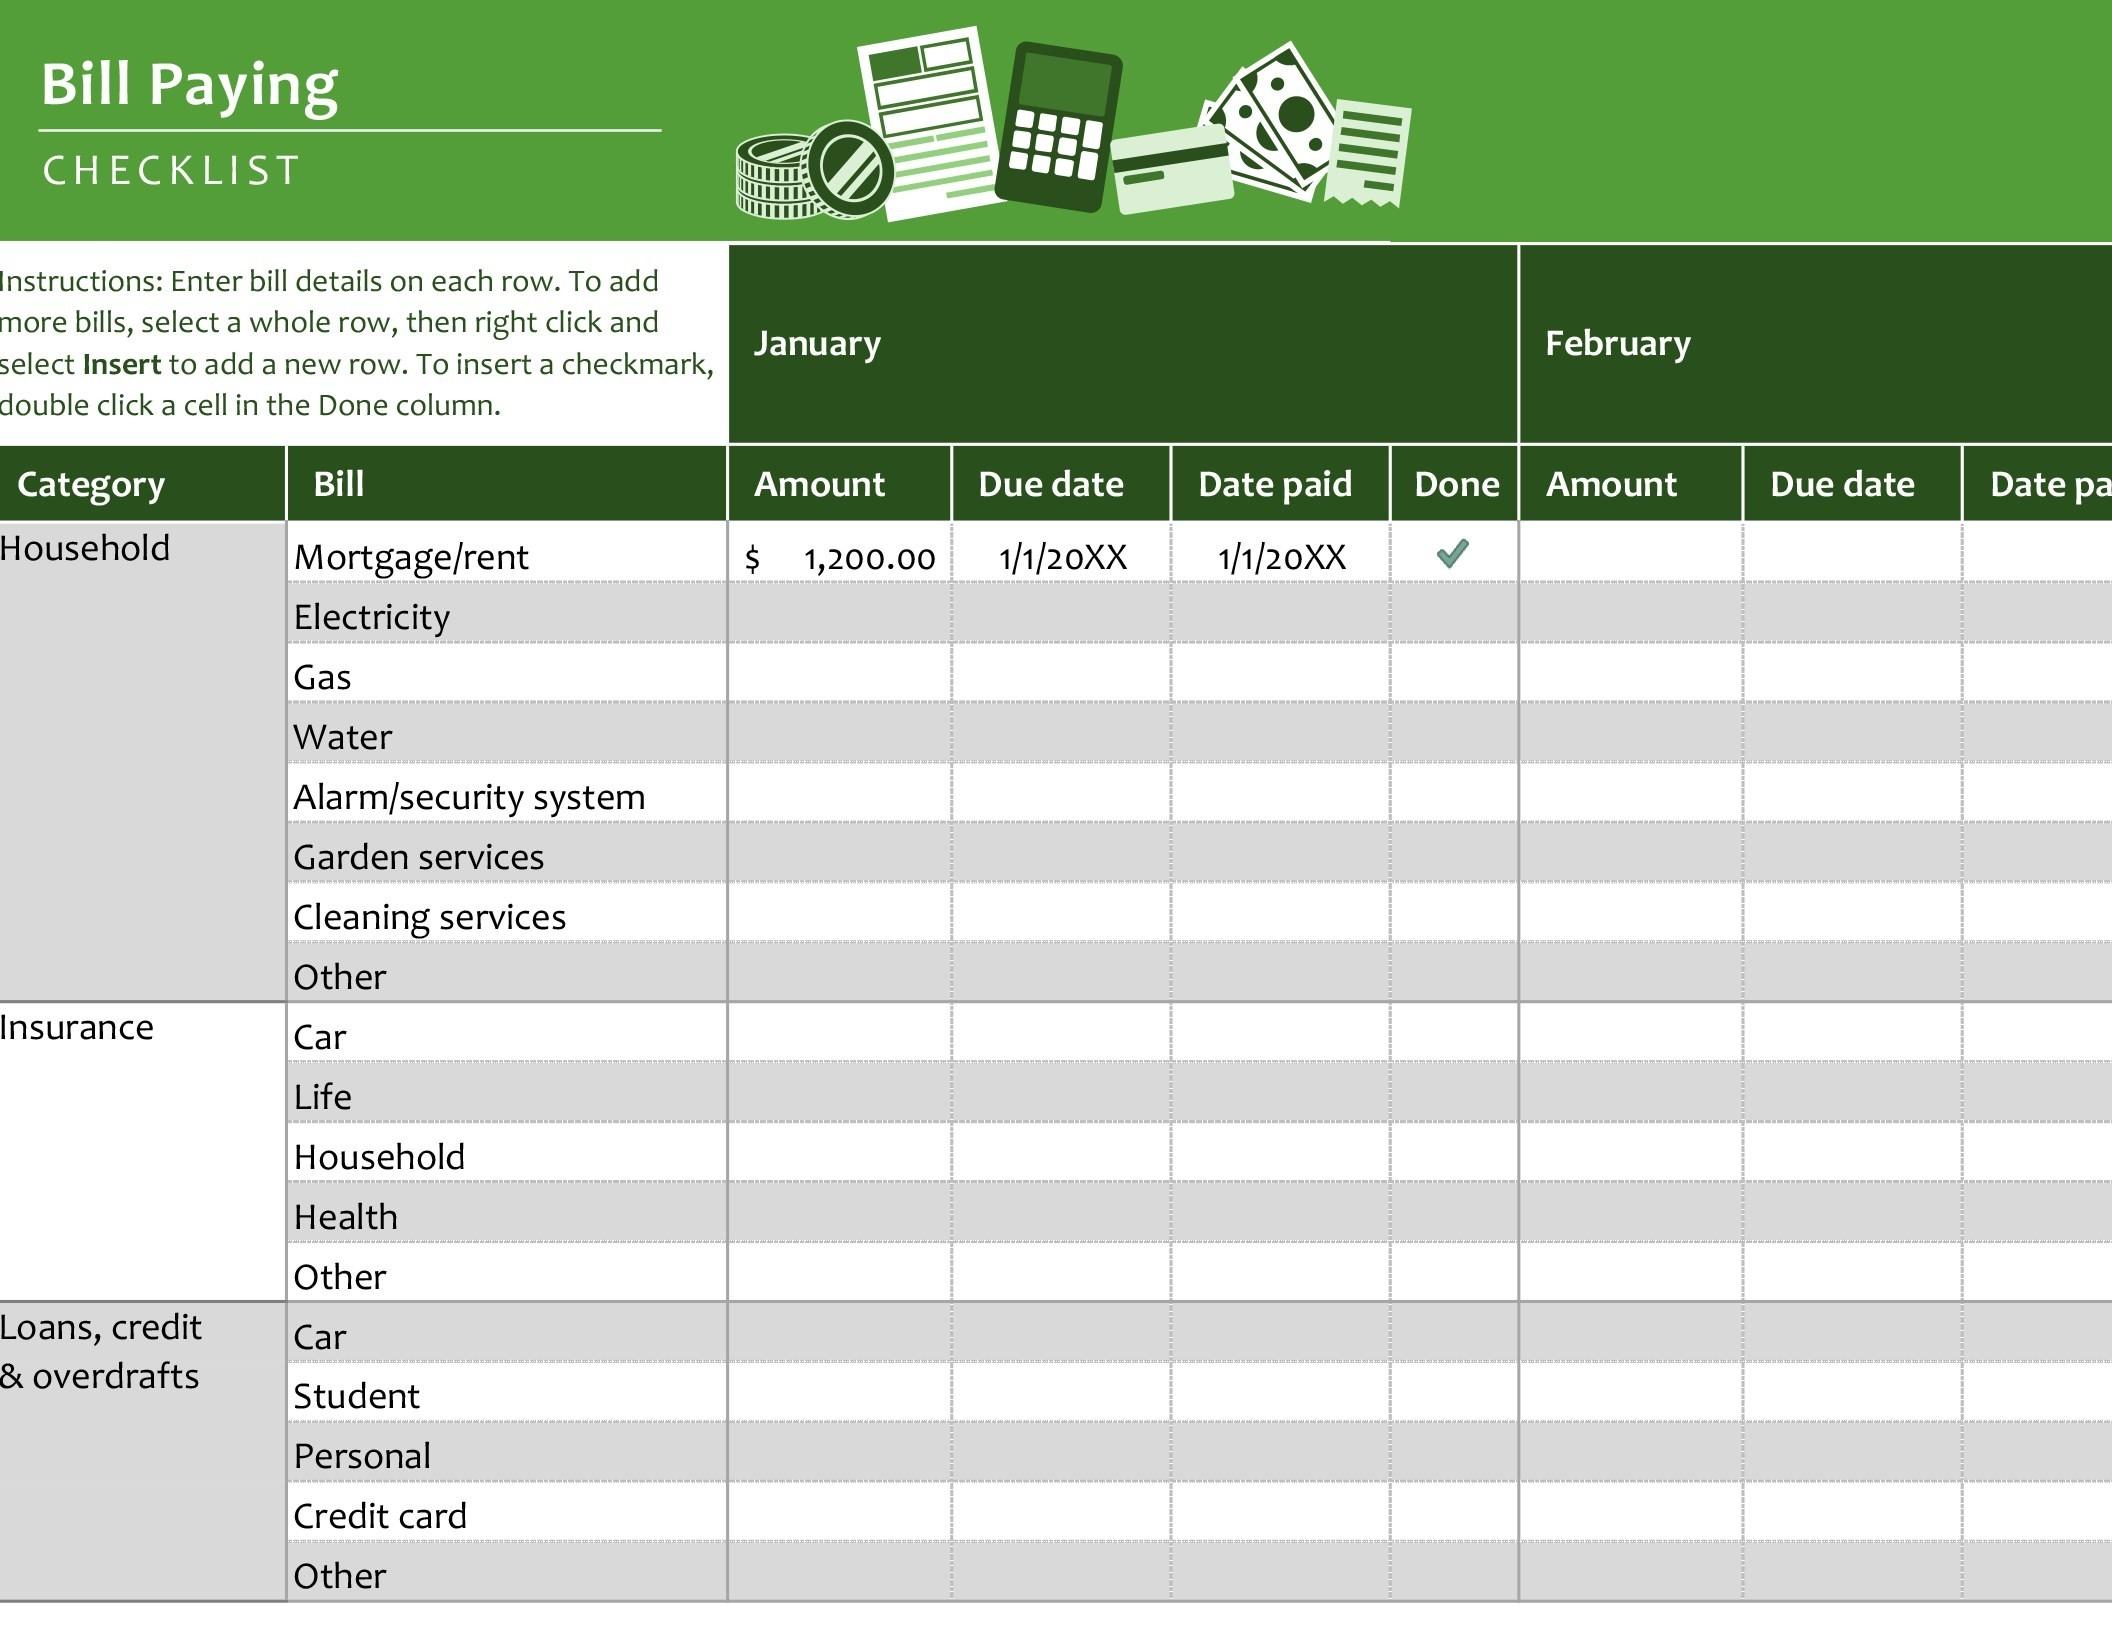 Bill Paying Checklist-List Of Bills Template